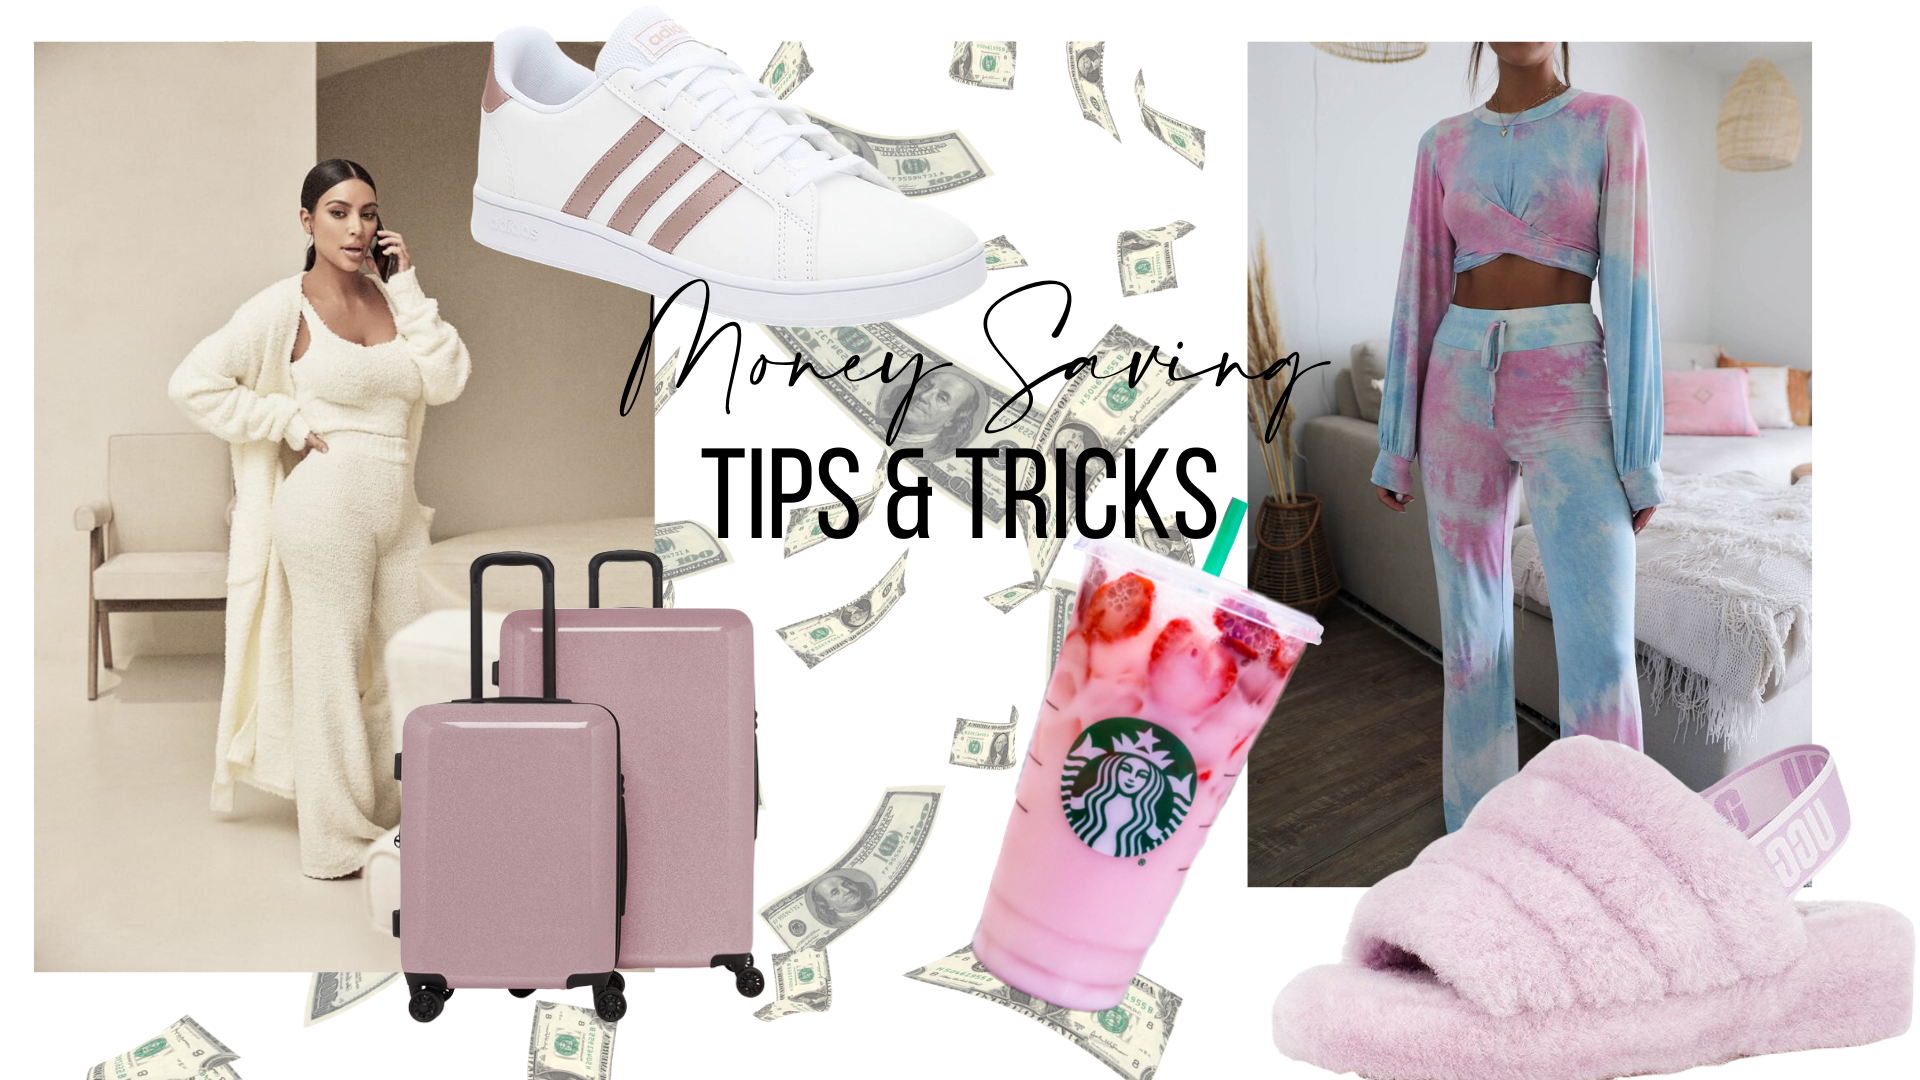 Money Saving Tips & Tricks from a Shopaholic